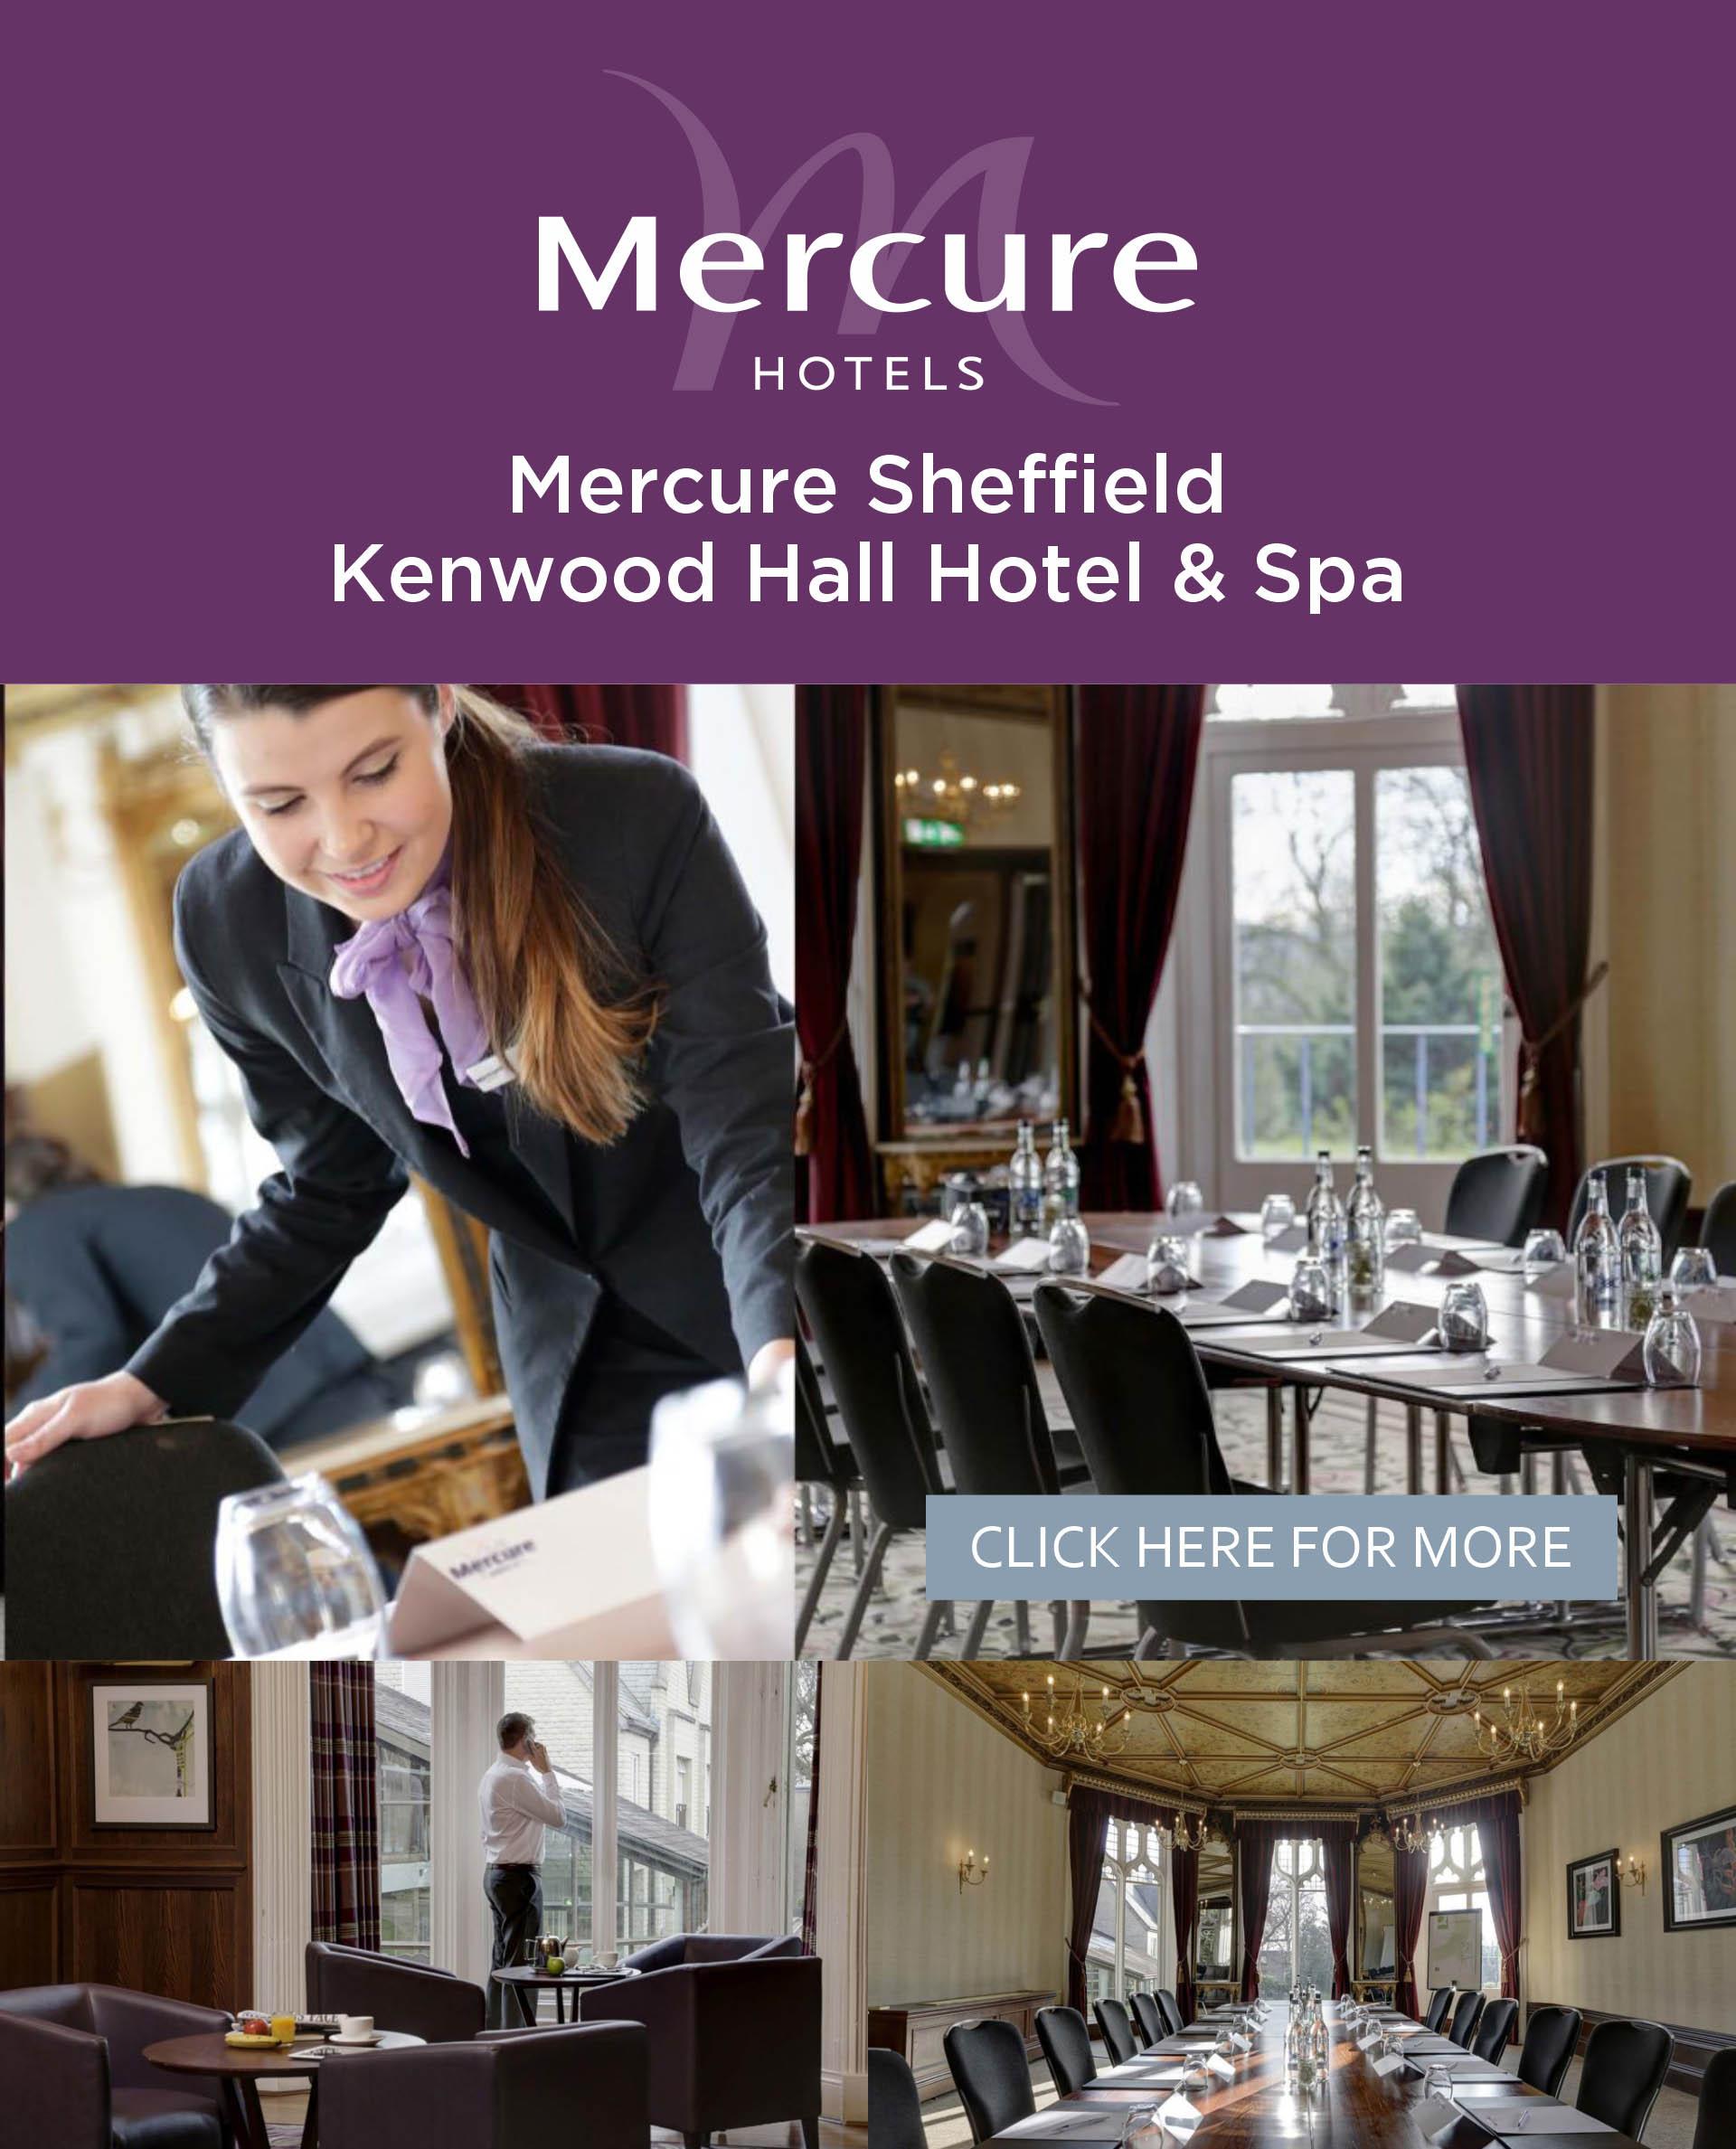 Kenwood Hall Hotel & Spa meeting image